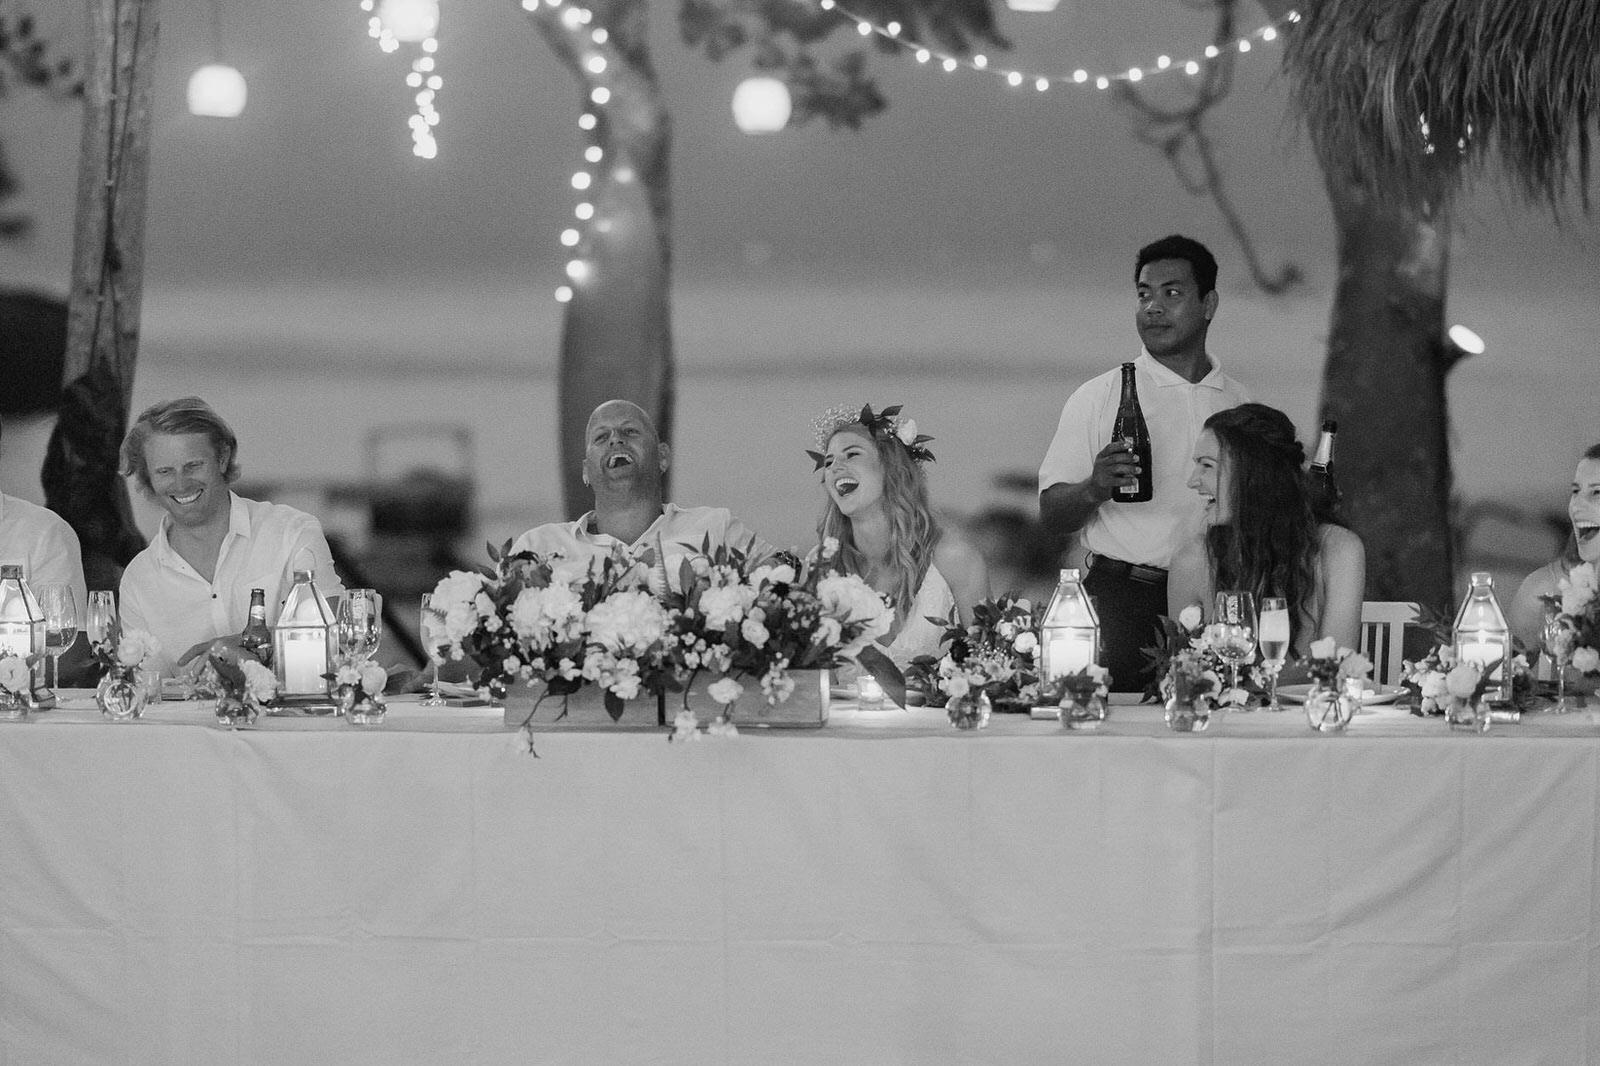 newfound-hai-tide-nusa-lembongan-bali-wedding-photographers-148